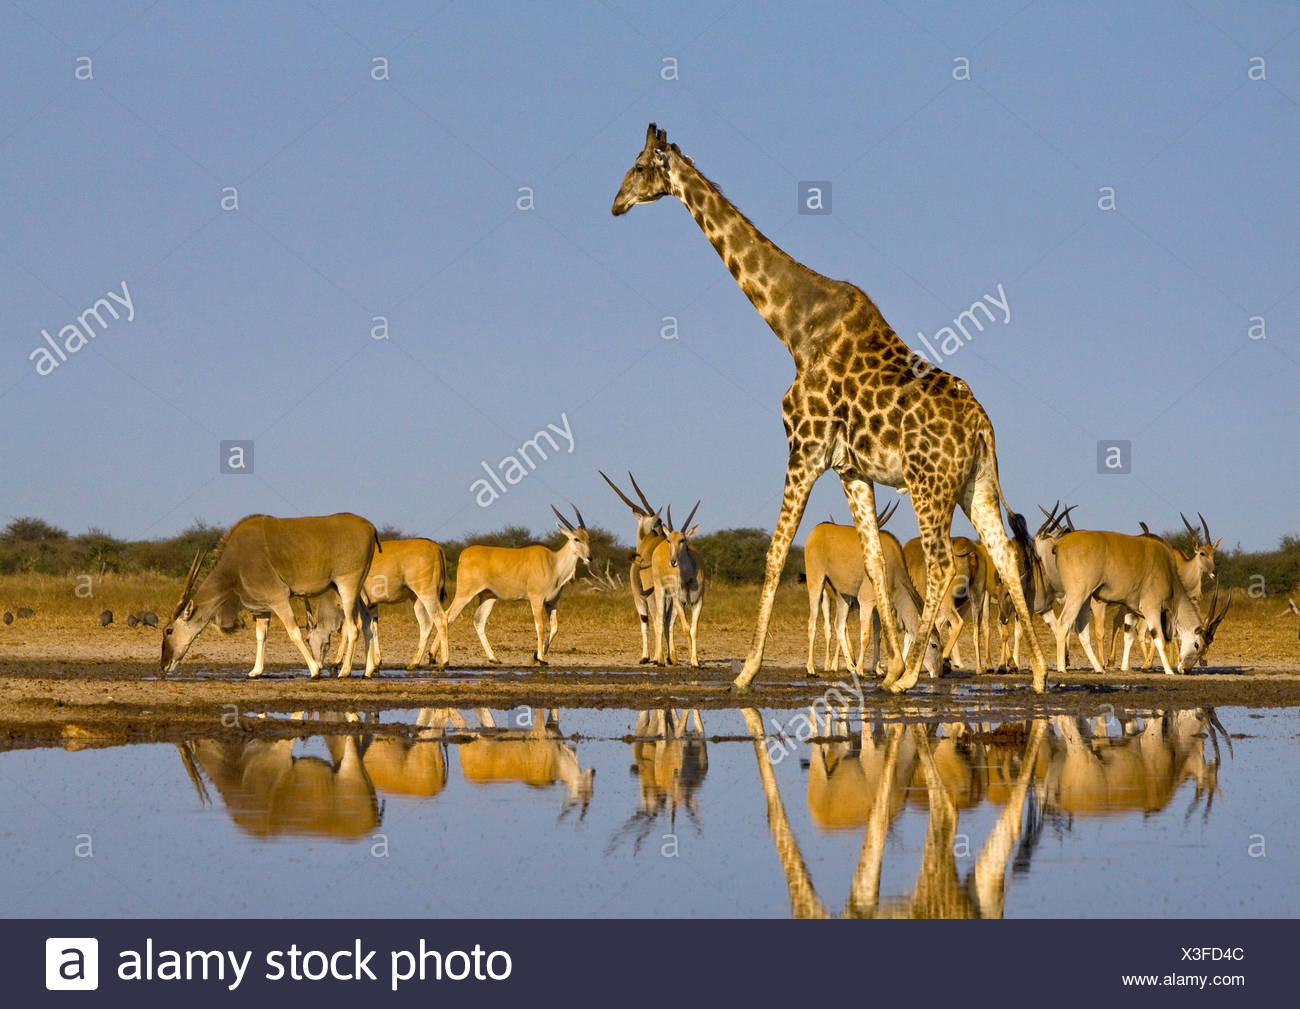 Giraffa e Eland a Waterhole, il Parco Nazionale di Etosha, Namibia. Immagini Stock